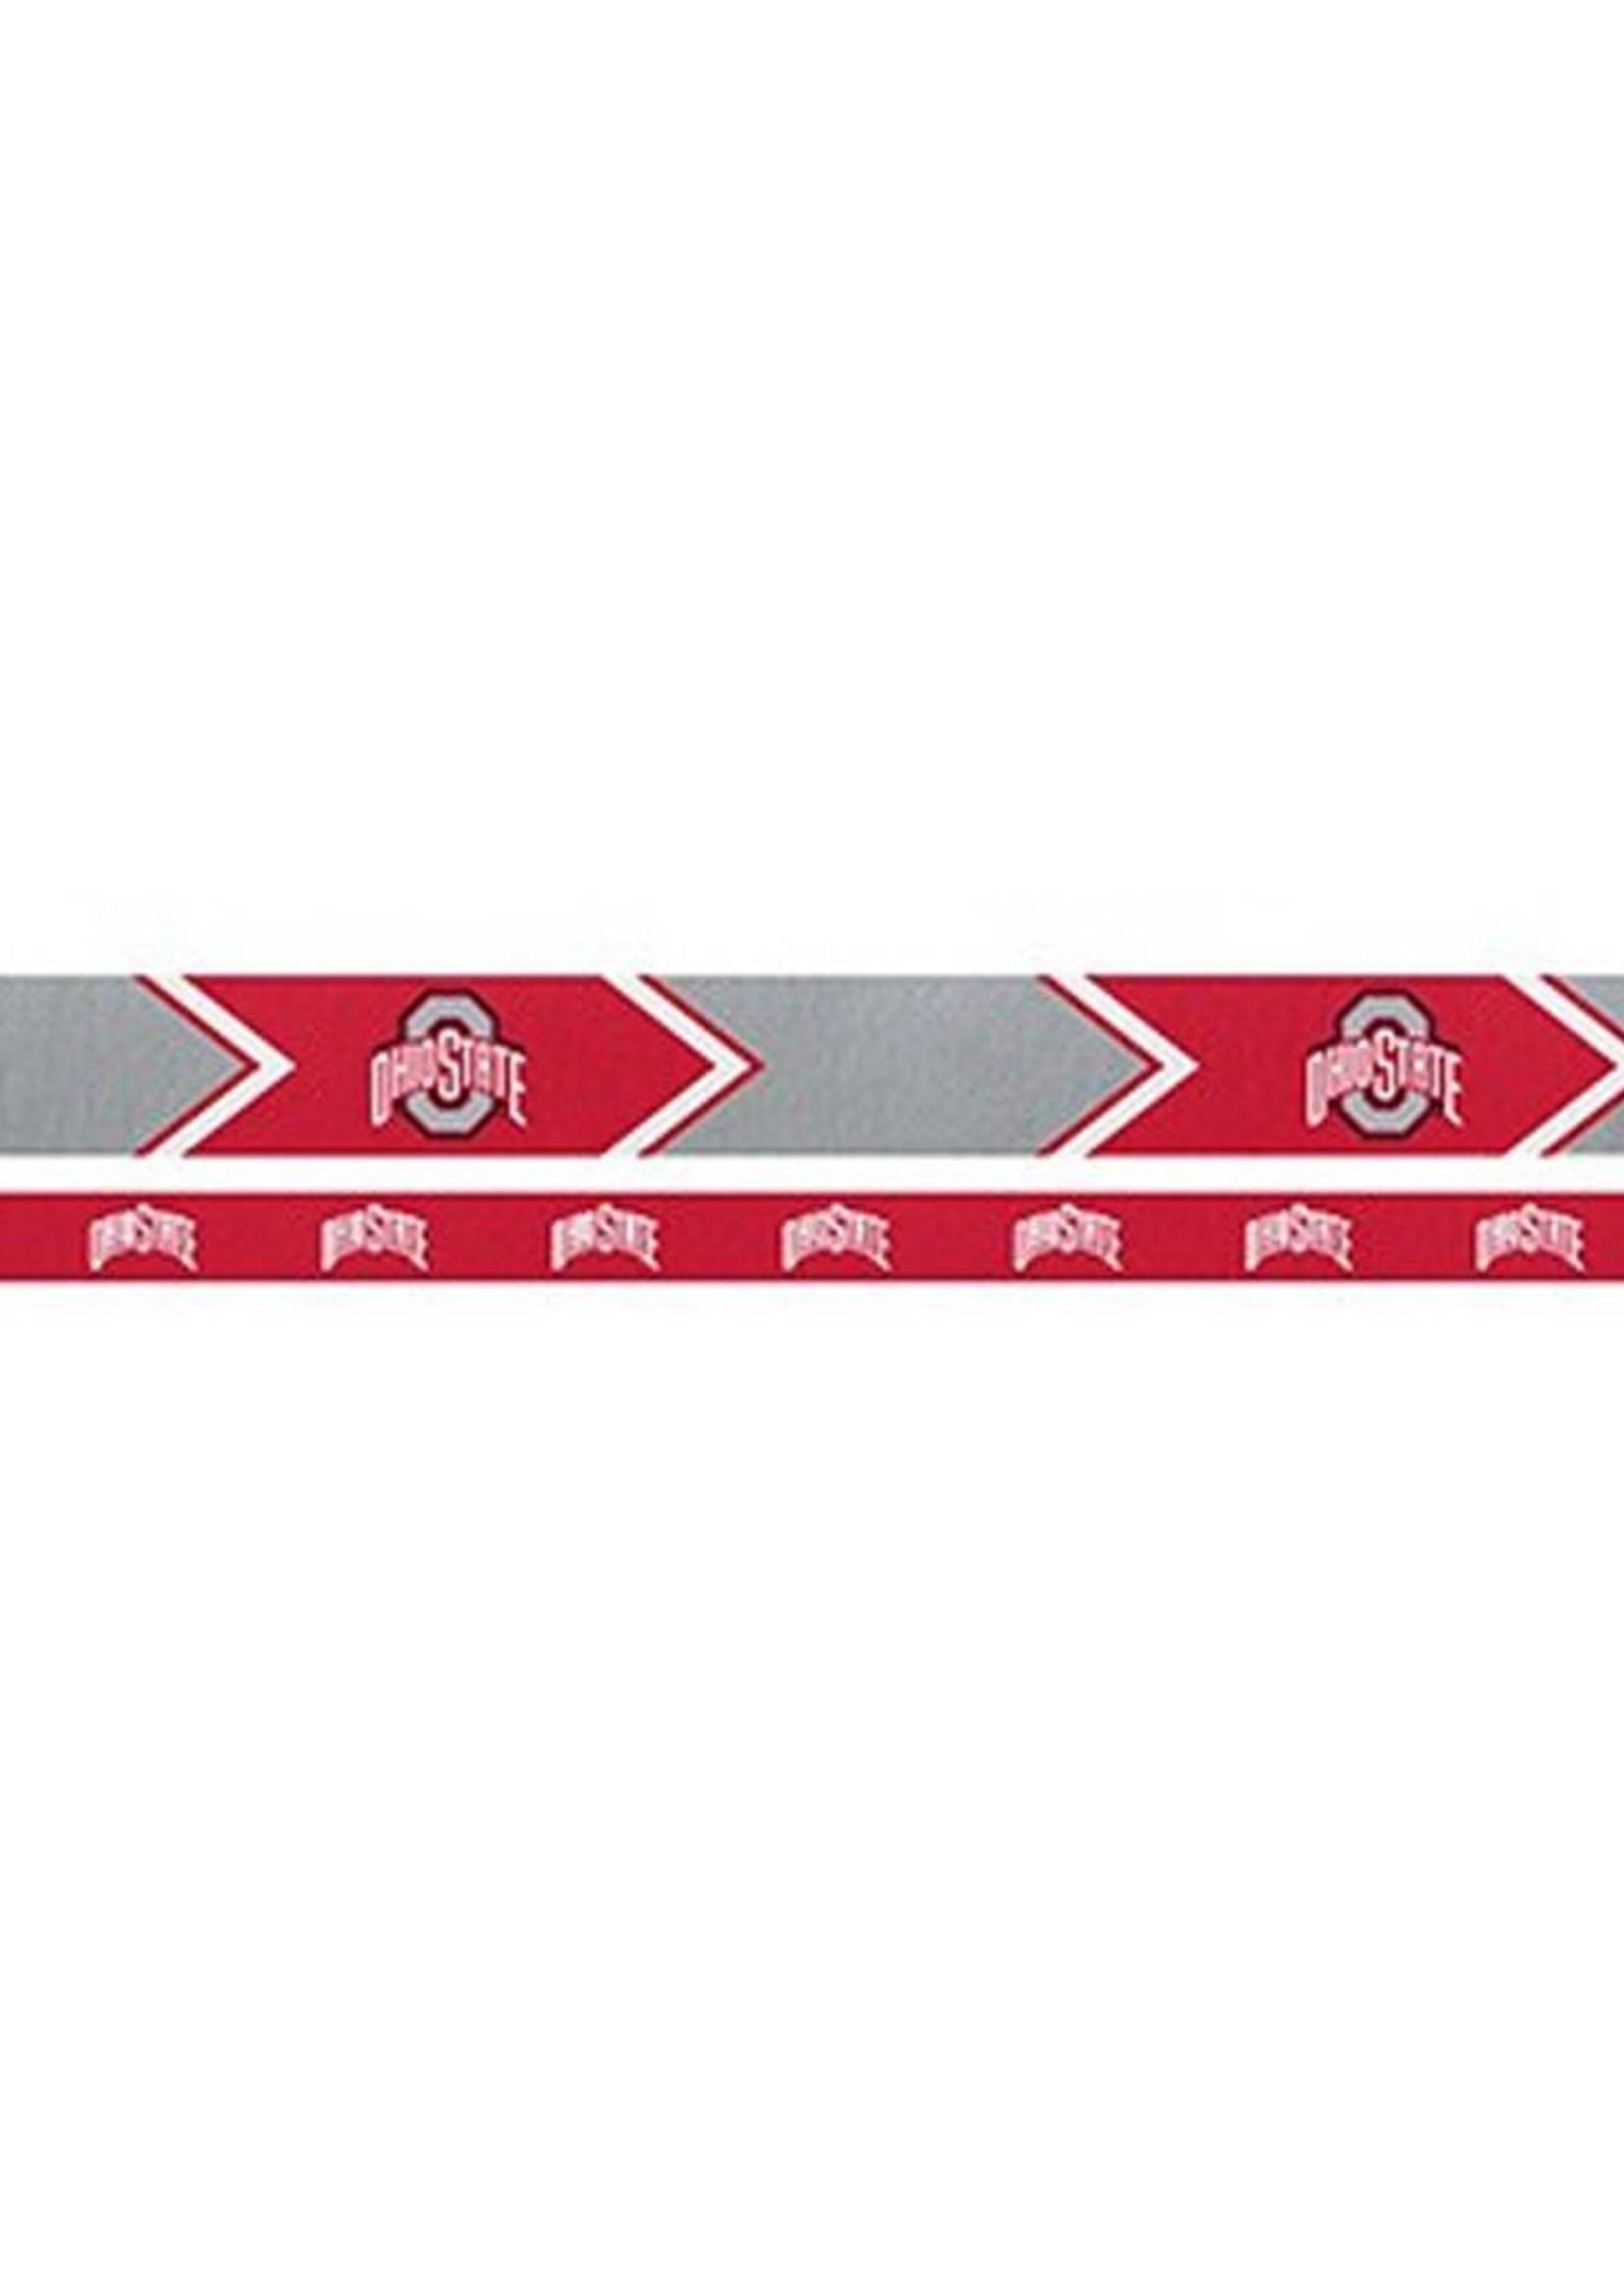 Ohio State University Headband Set